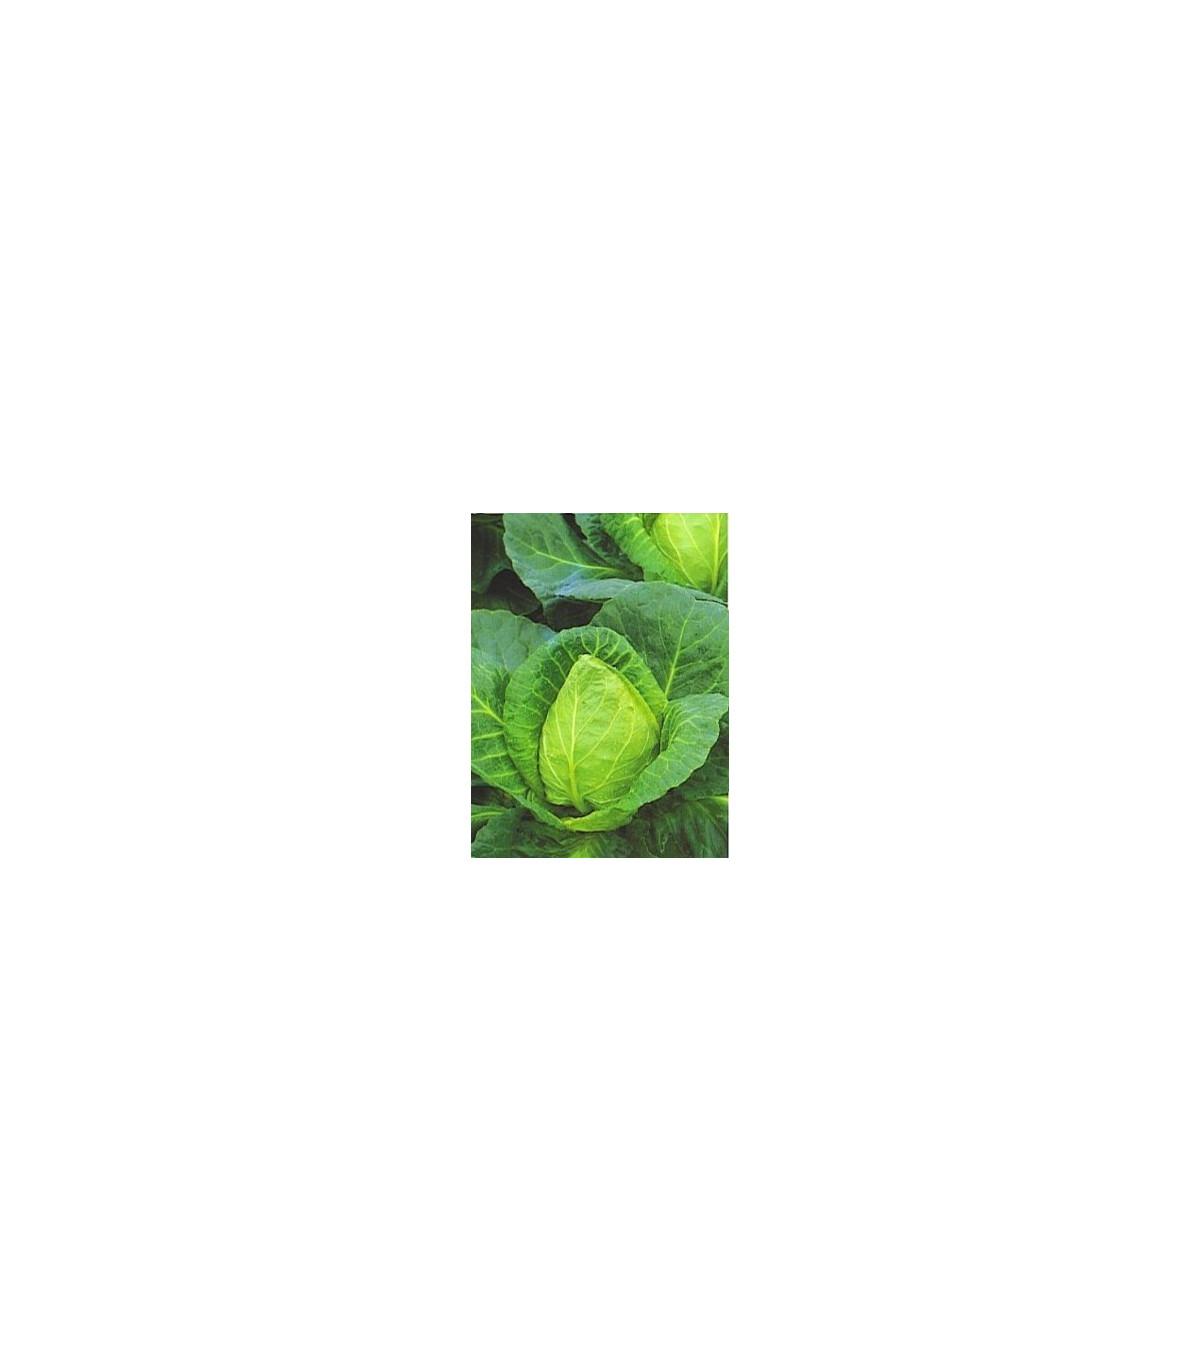 Kapusta biela veľmi skorá - semená kapusty - semiačka - 0,8 gr